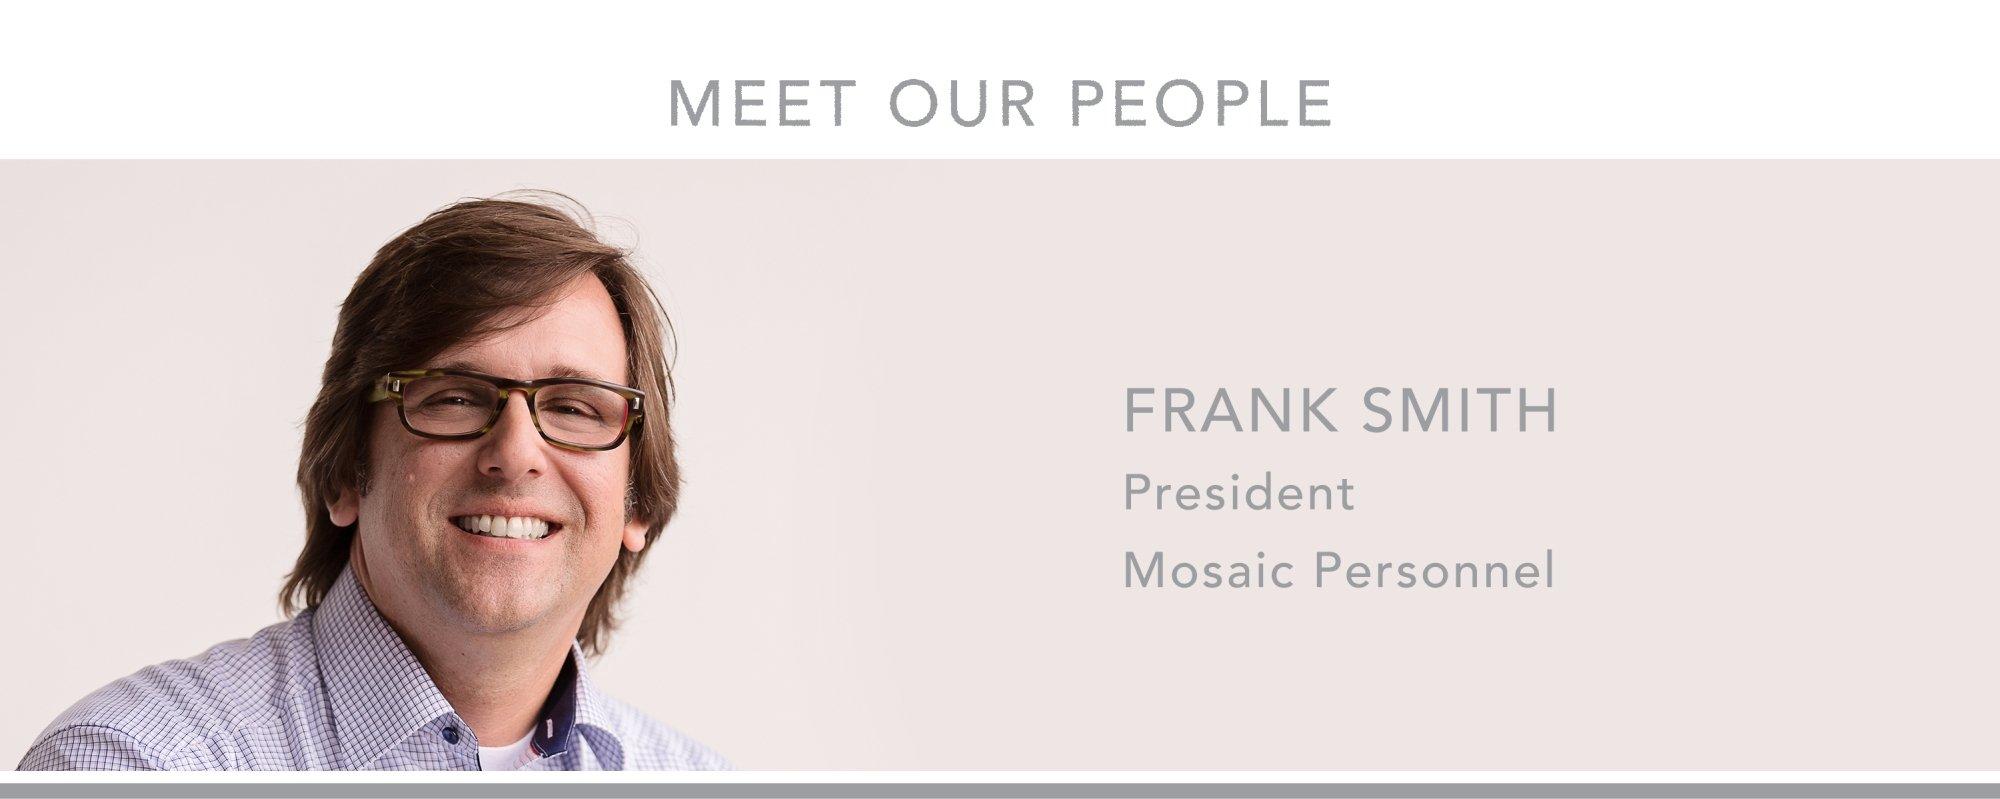 President Frank Smith